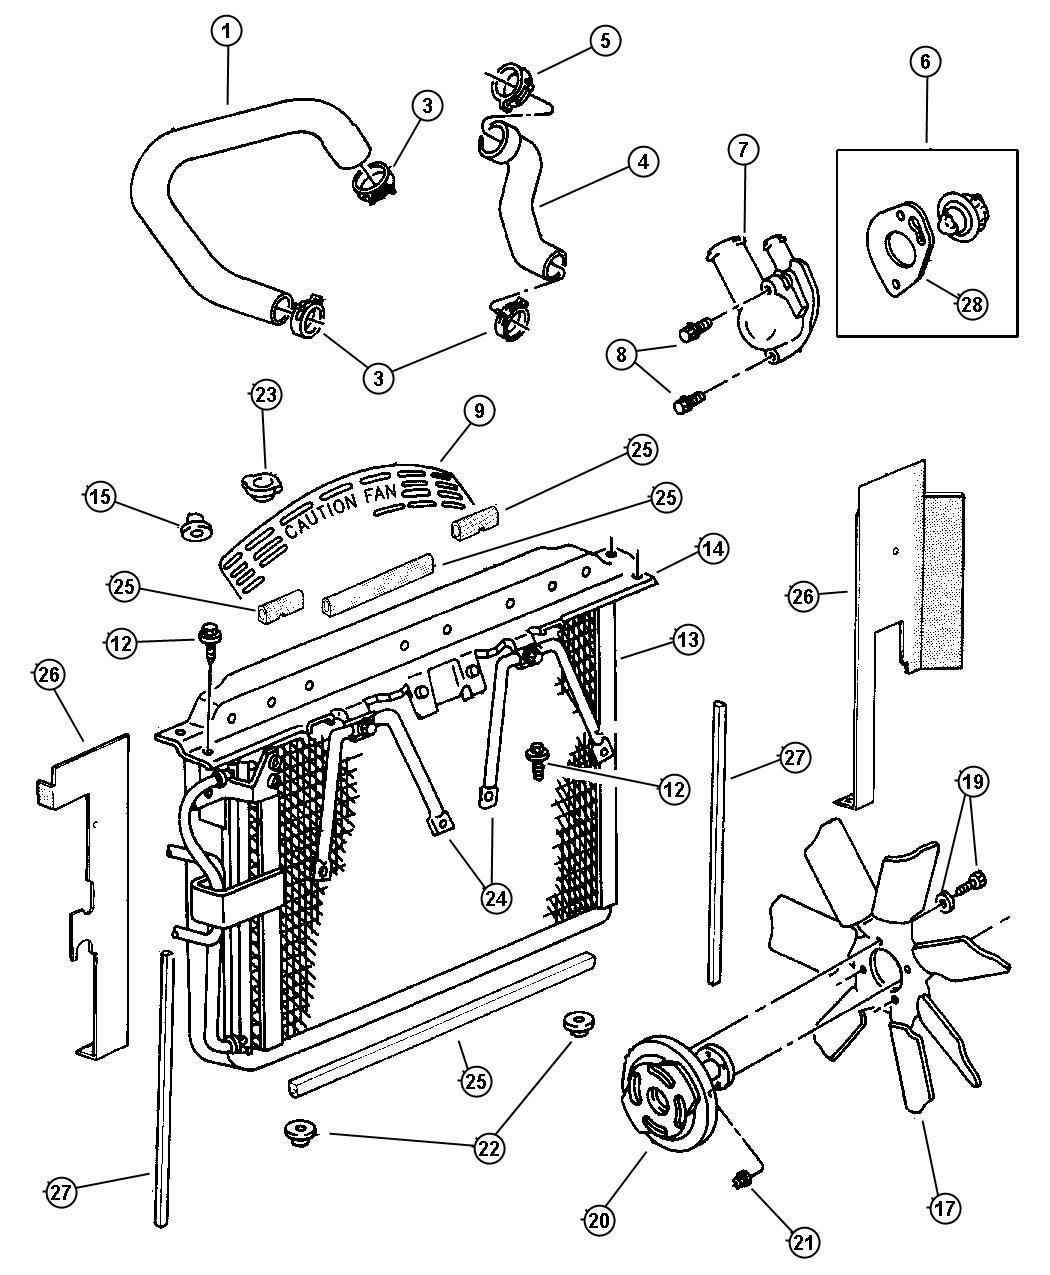 Dodge Ram 3500 Shroud. Fan. Engine, related, radiator